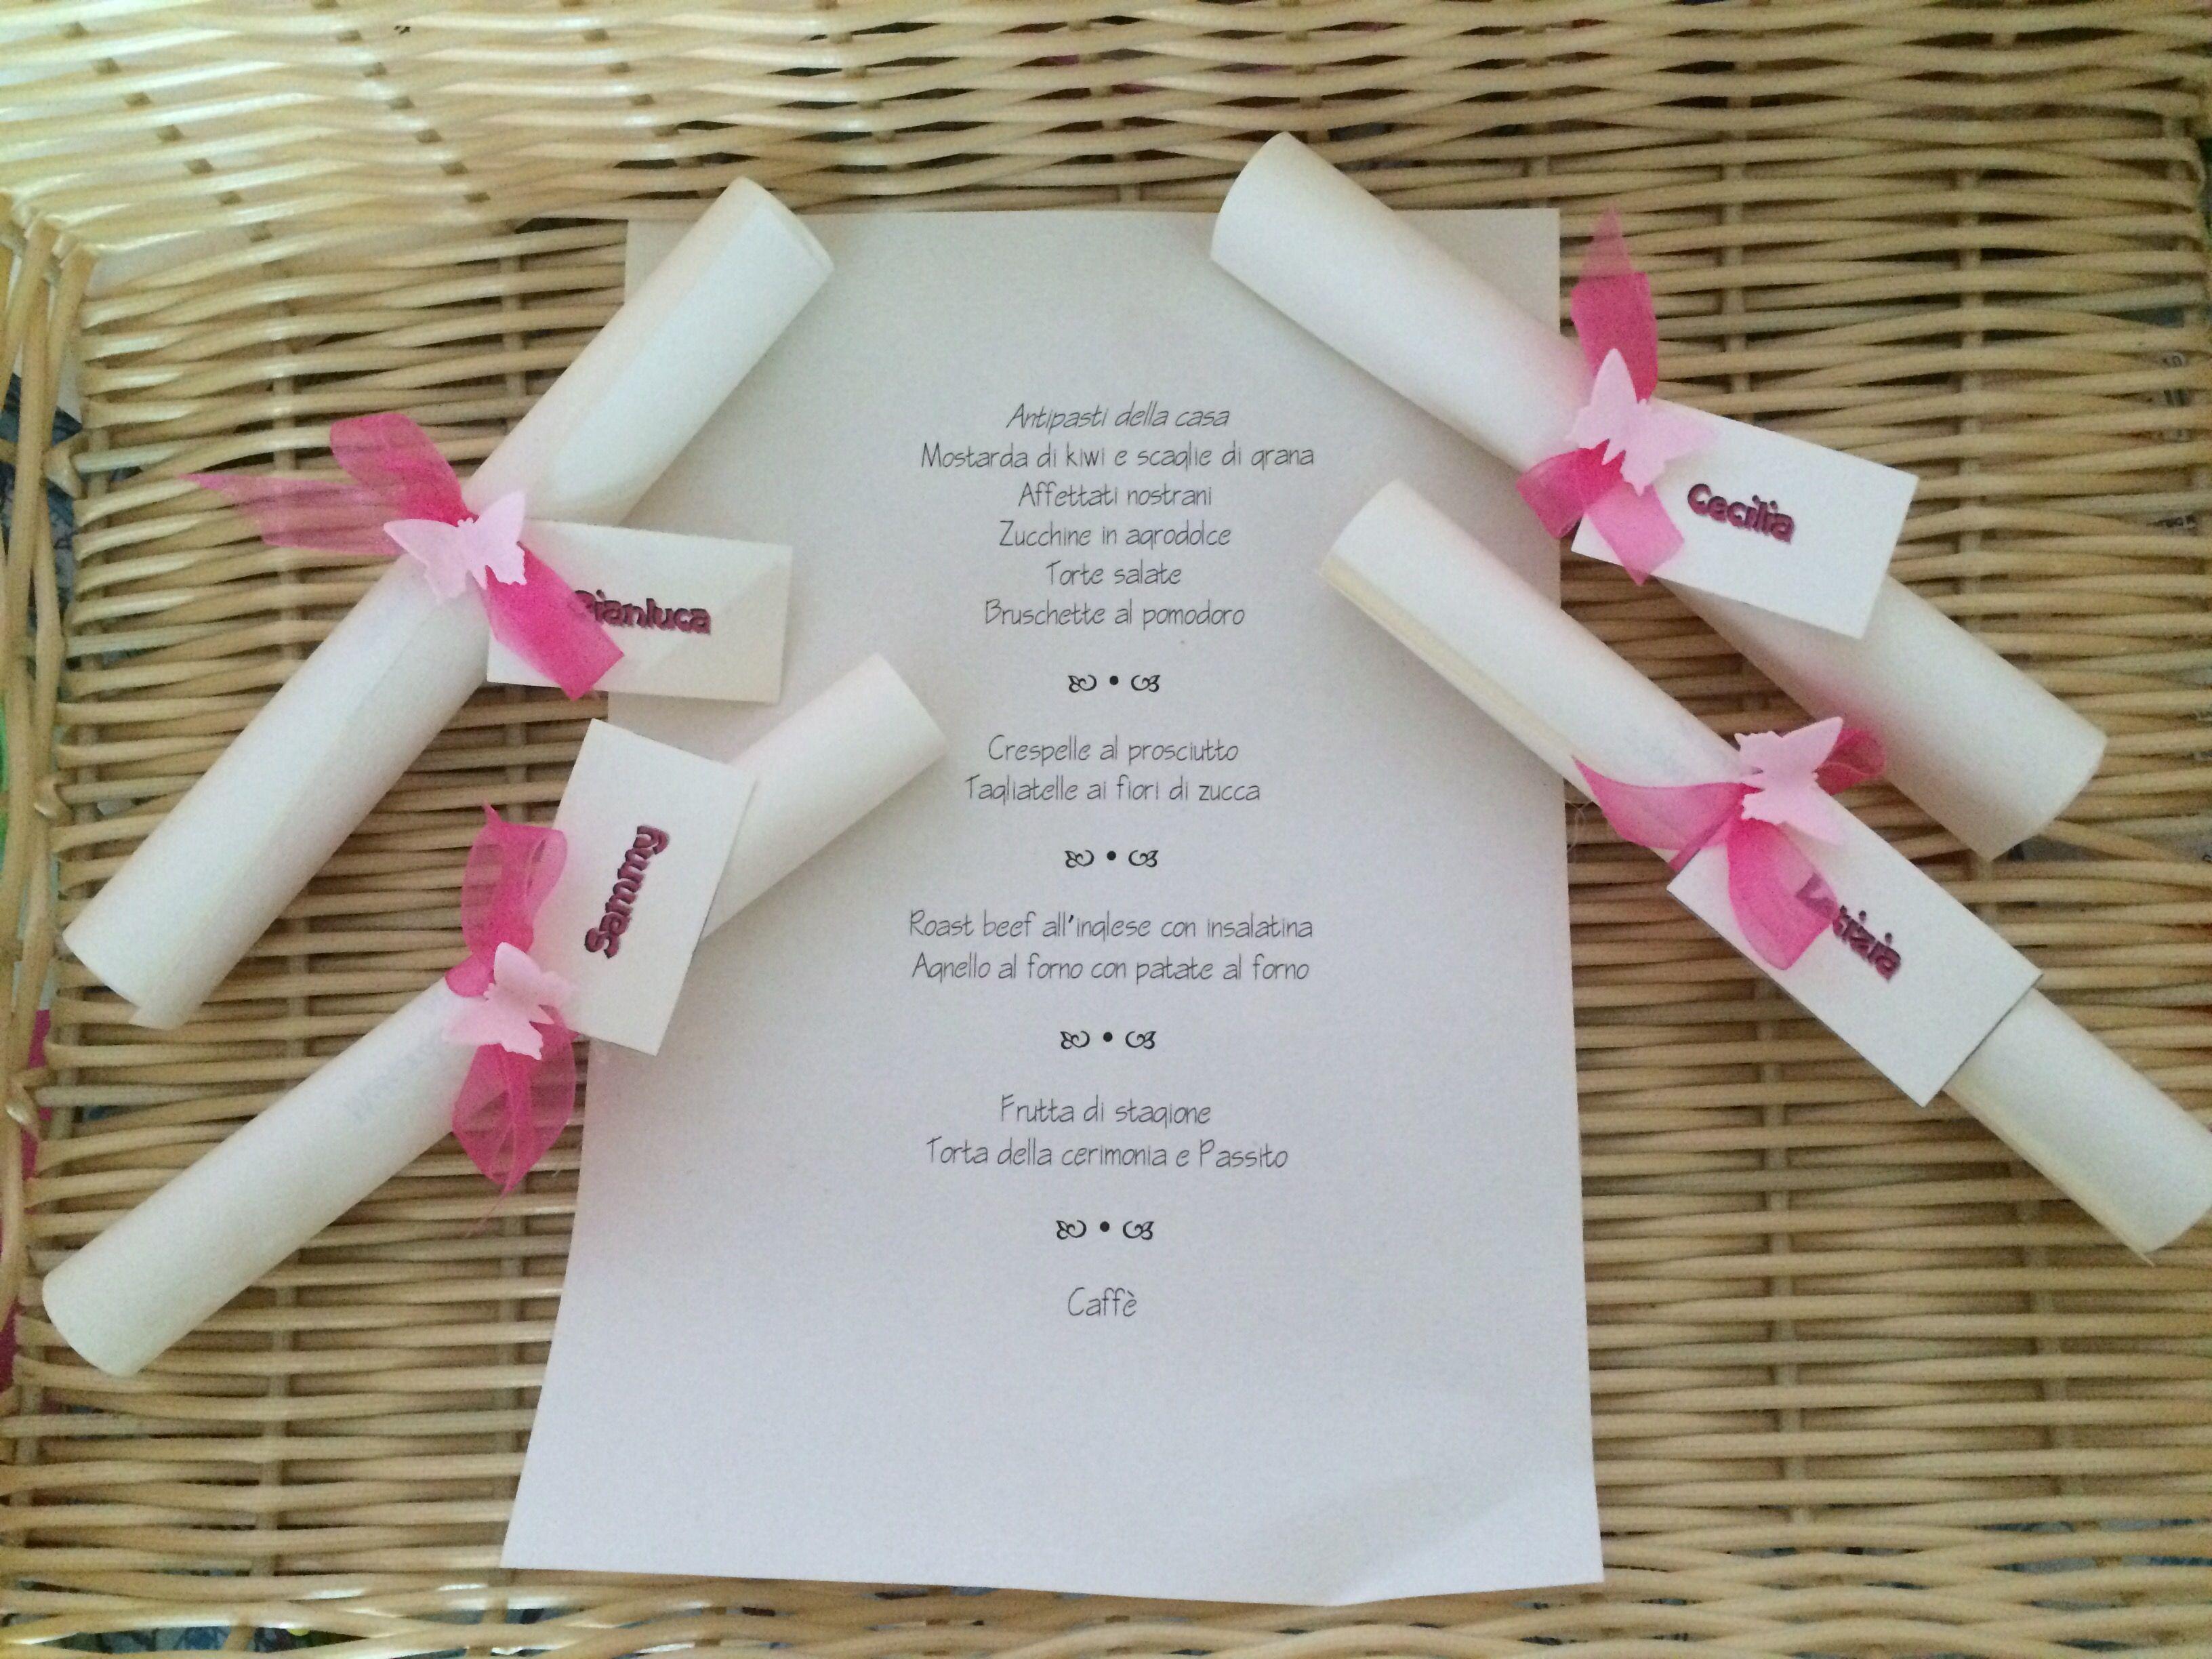 Pergamena Segnaposto Matrimonio.Pergamene Menu E Segnaposto Battesimo Farfalle Isabelle